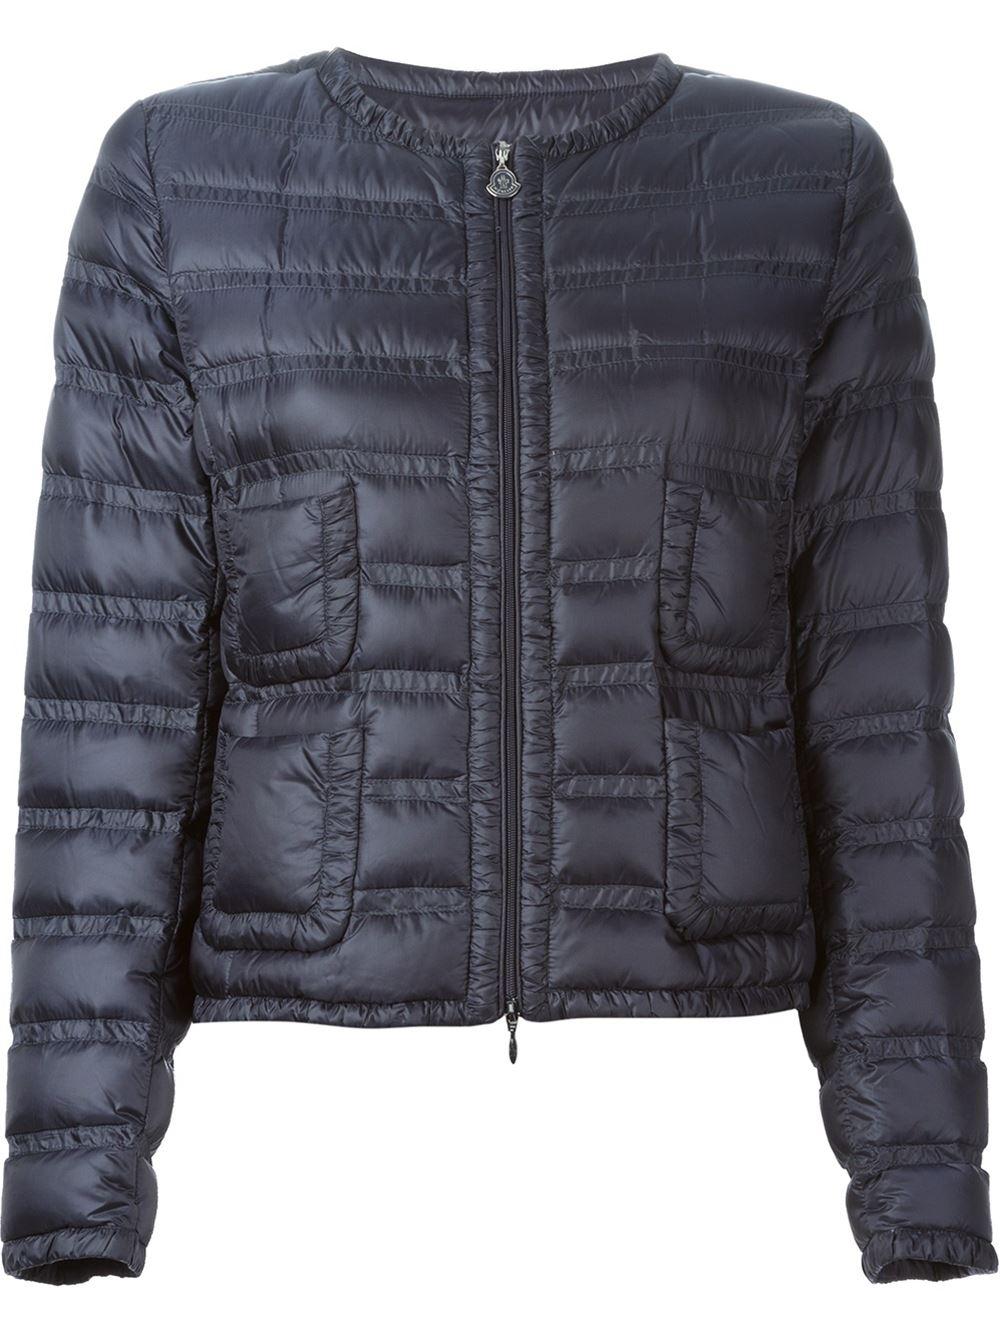 Moncler Navy Padded Jacket